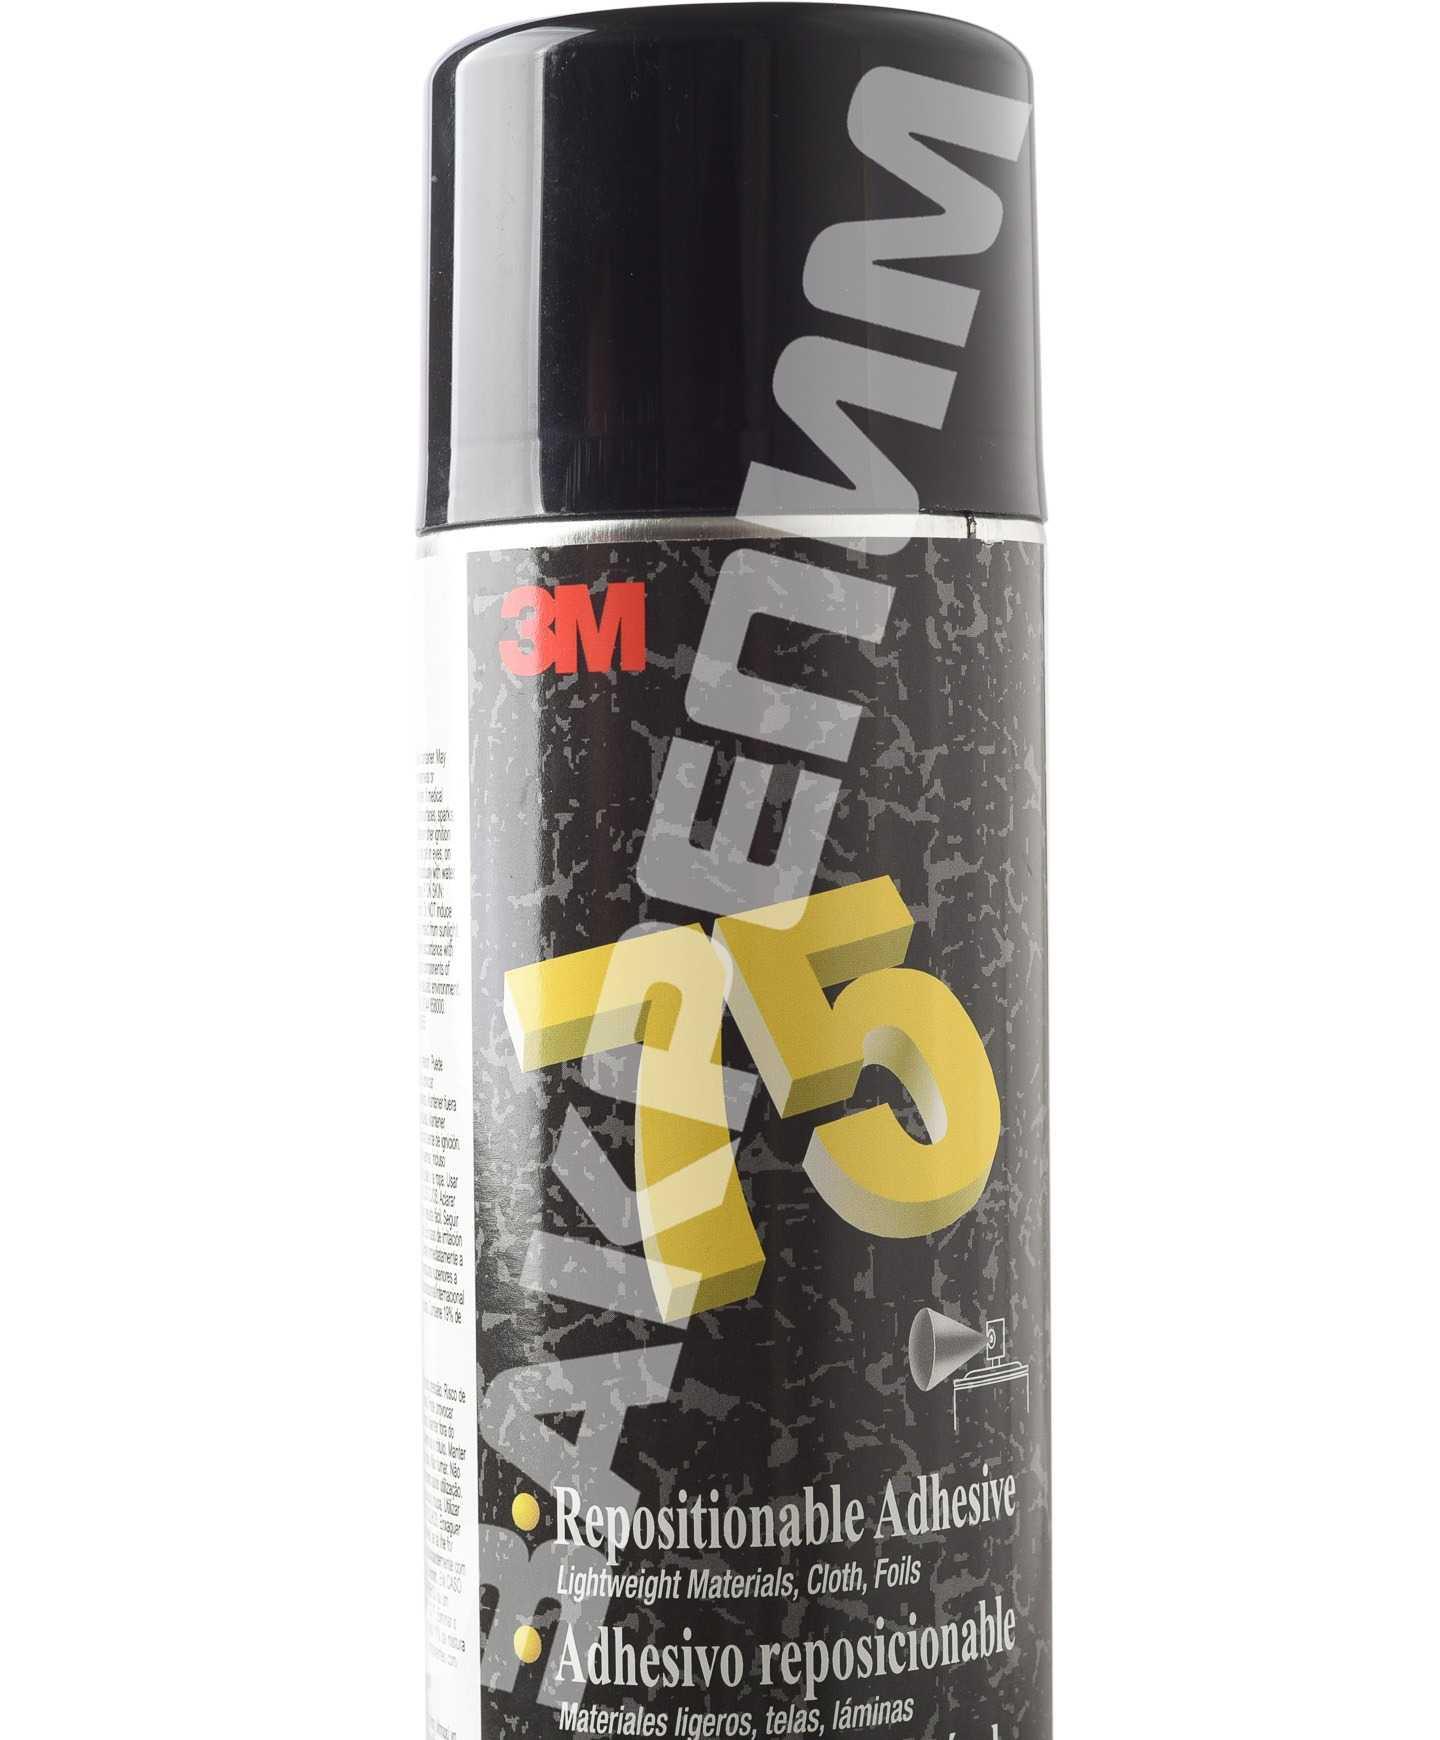 3m-75